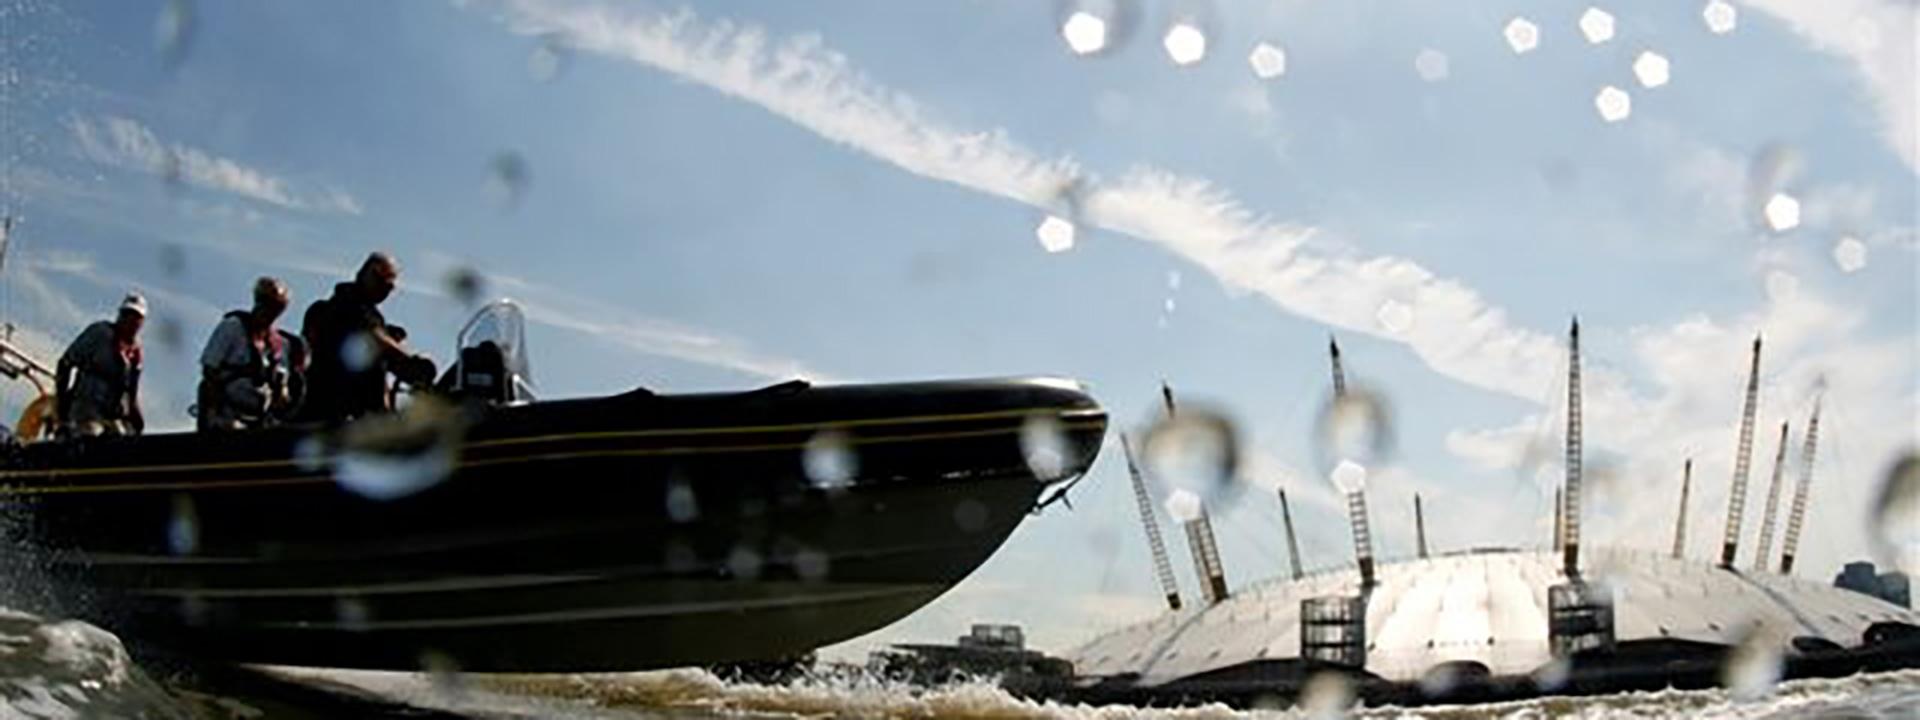 Rib Power Boat Charter 1